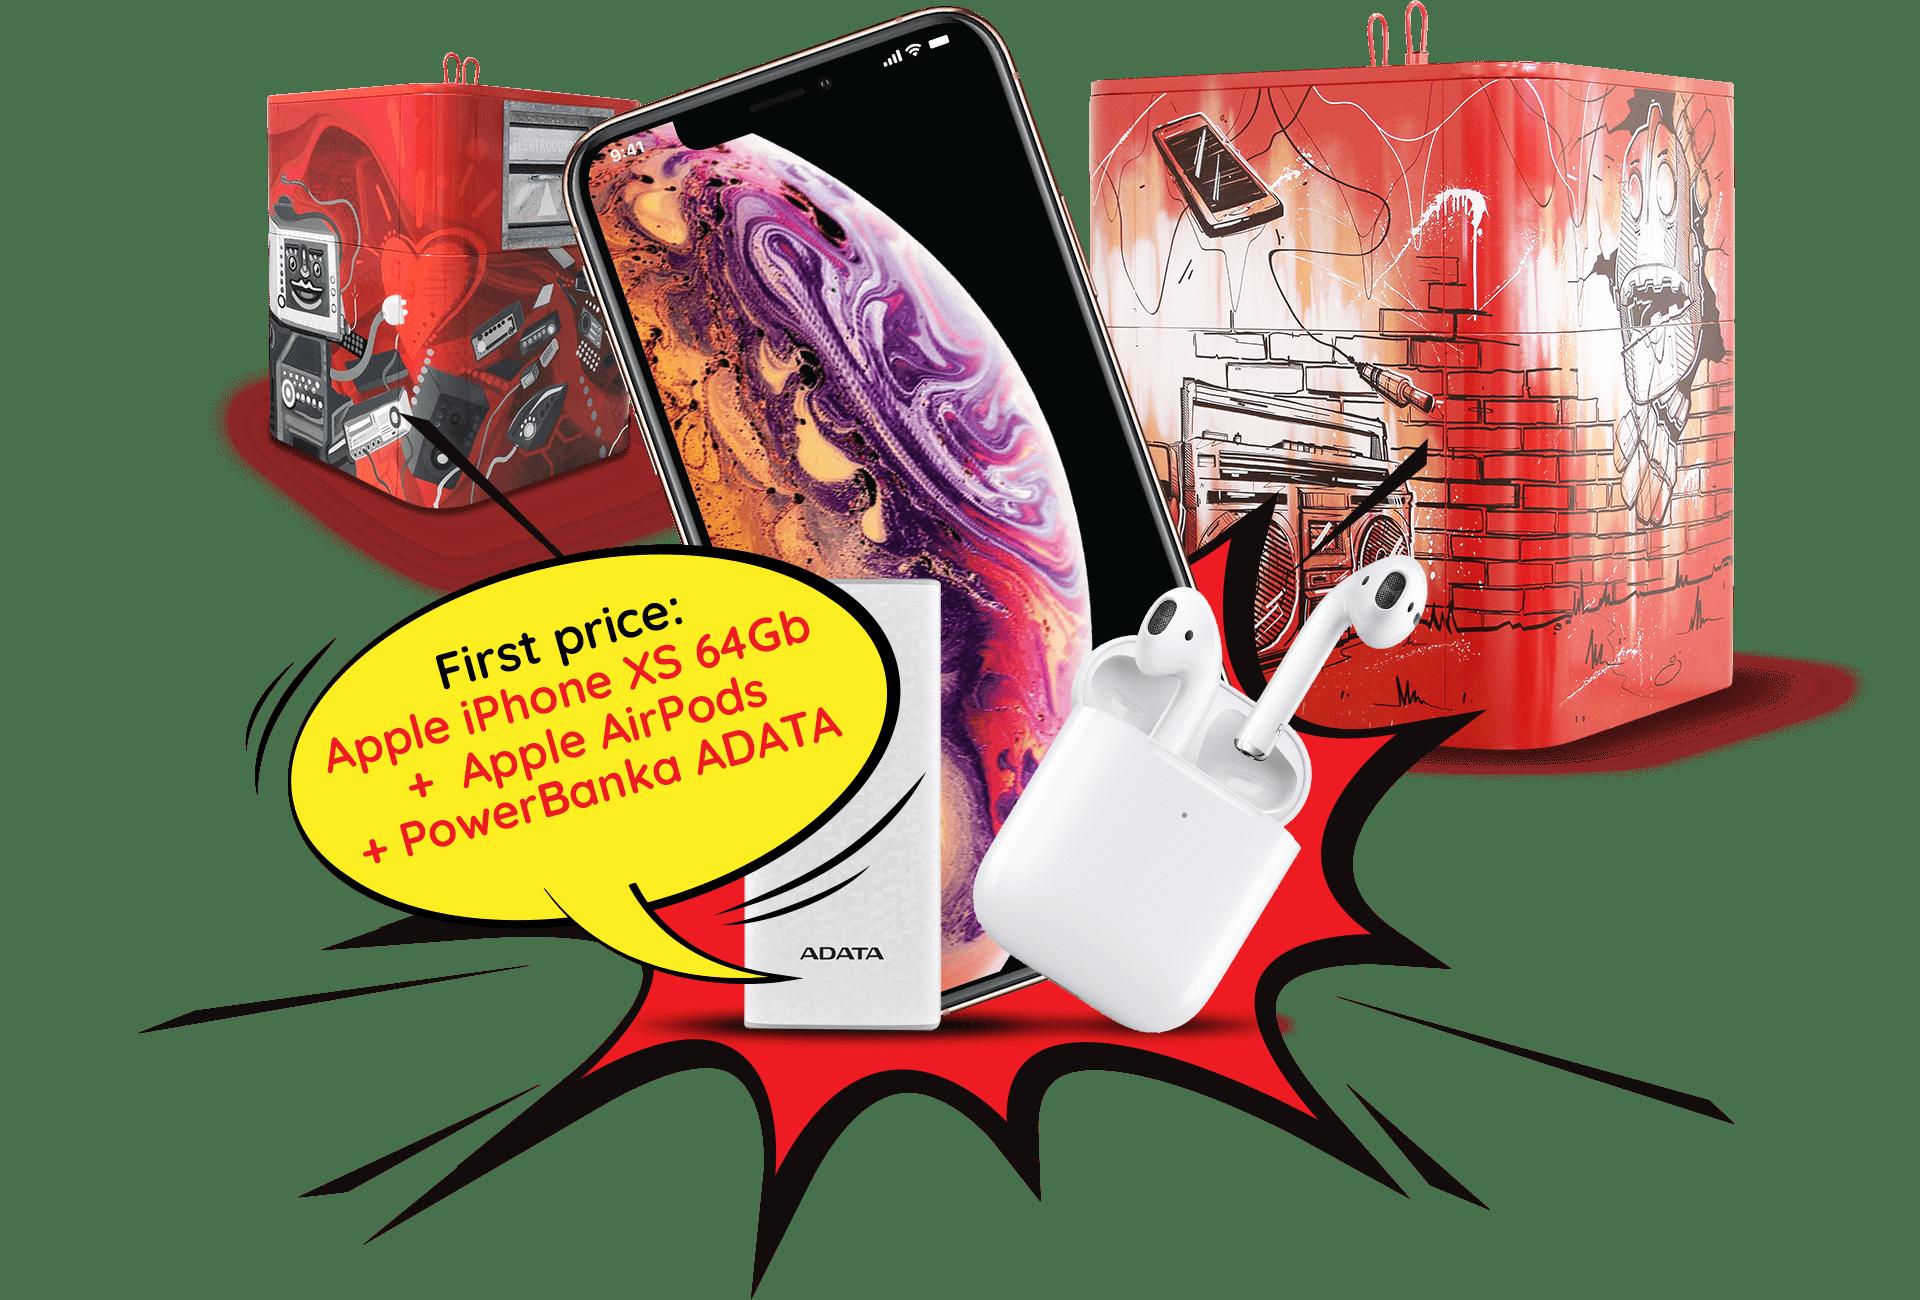 Vyhraj Apple iPhone XS + Apple Air Pods + powerbanku ADATA